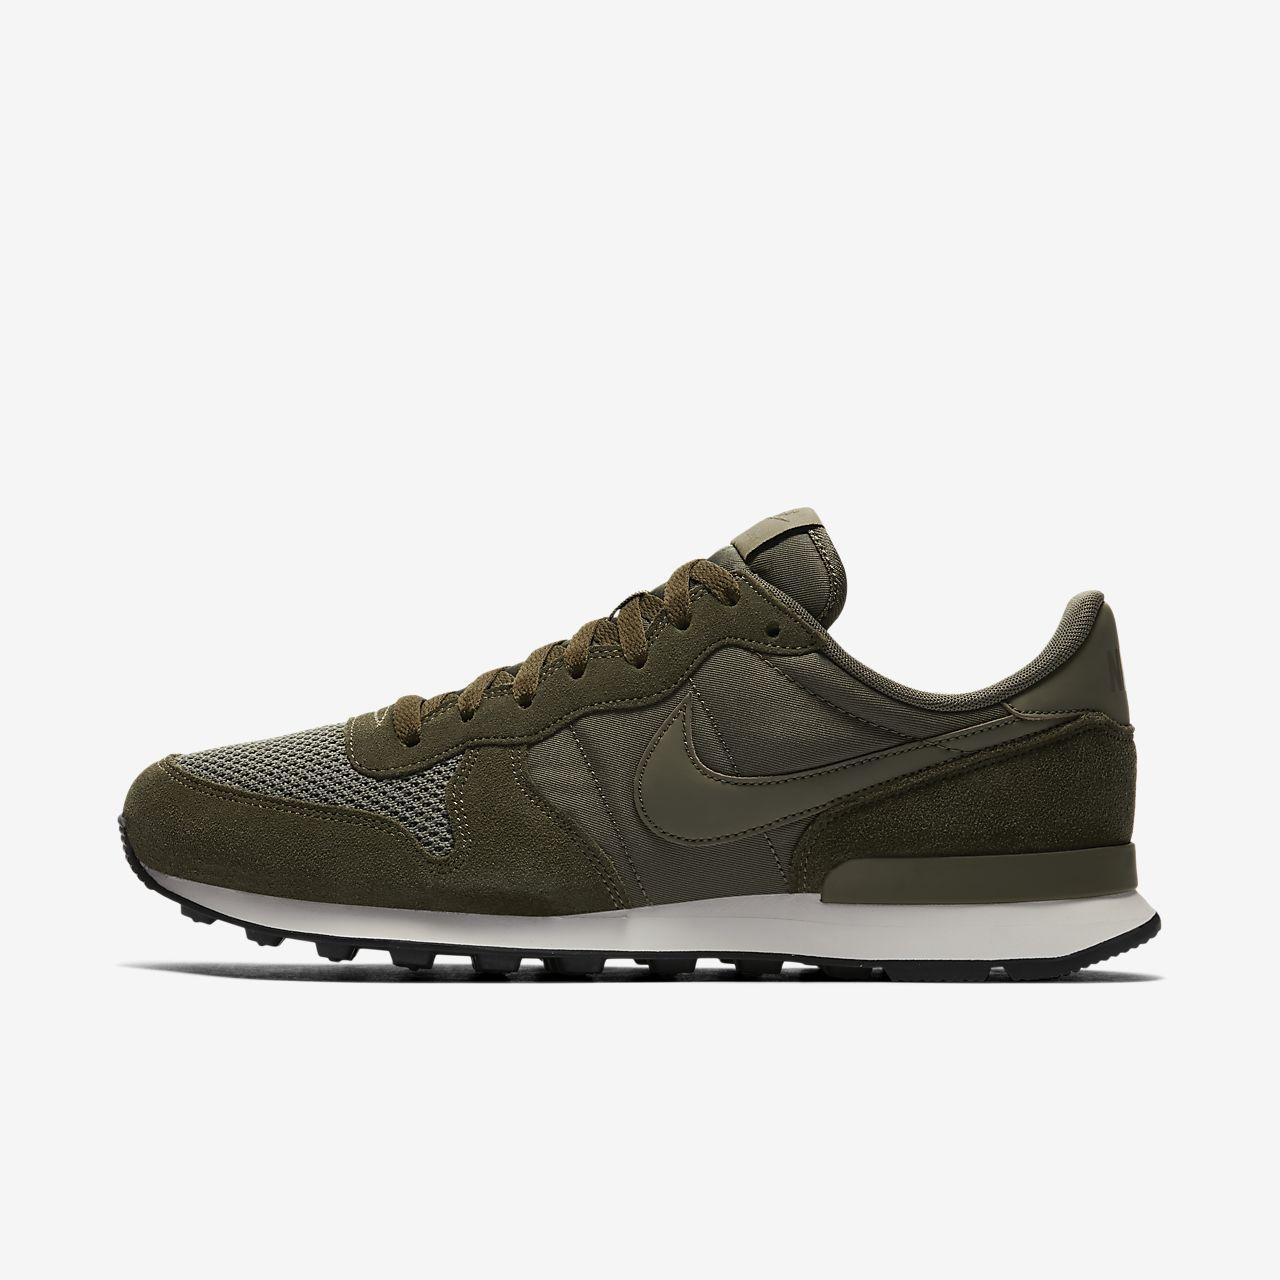 Chaussure Nike Nike Chaussure Internationalist Se Pour Ch 2a7cd4